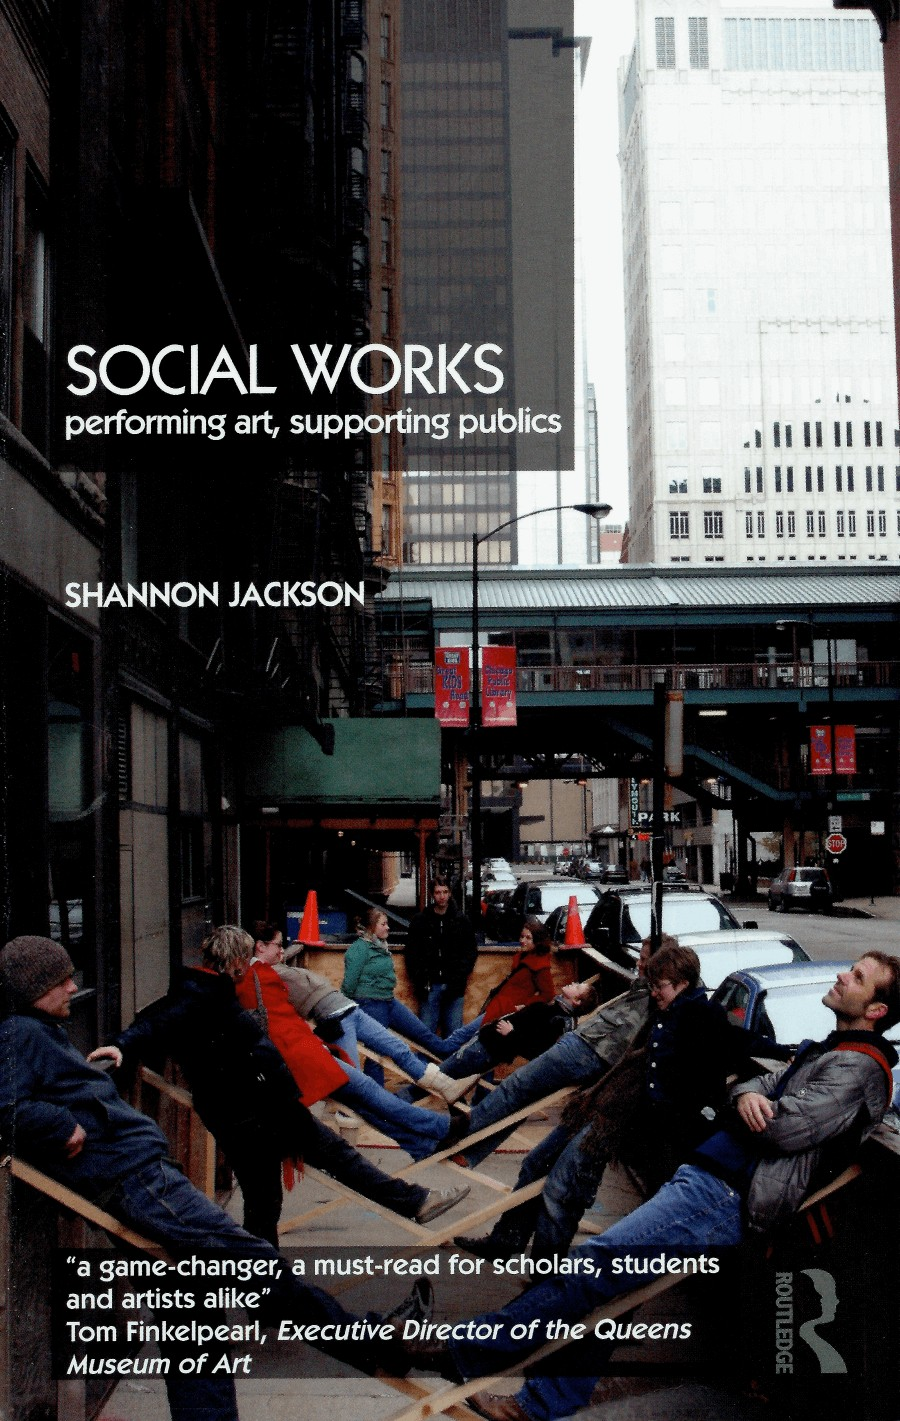 Social Works - Performing Art